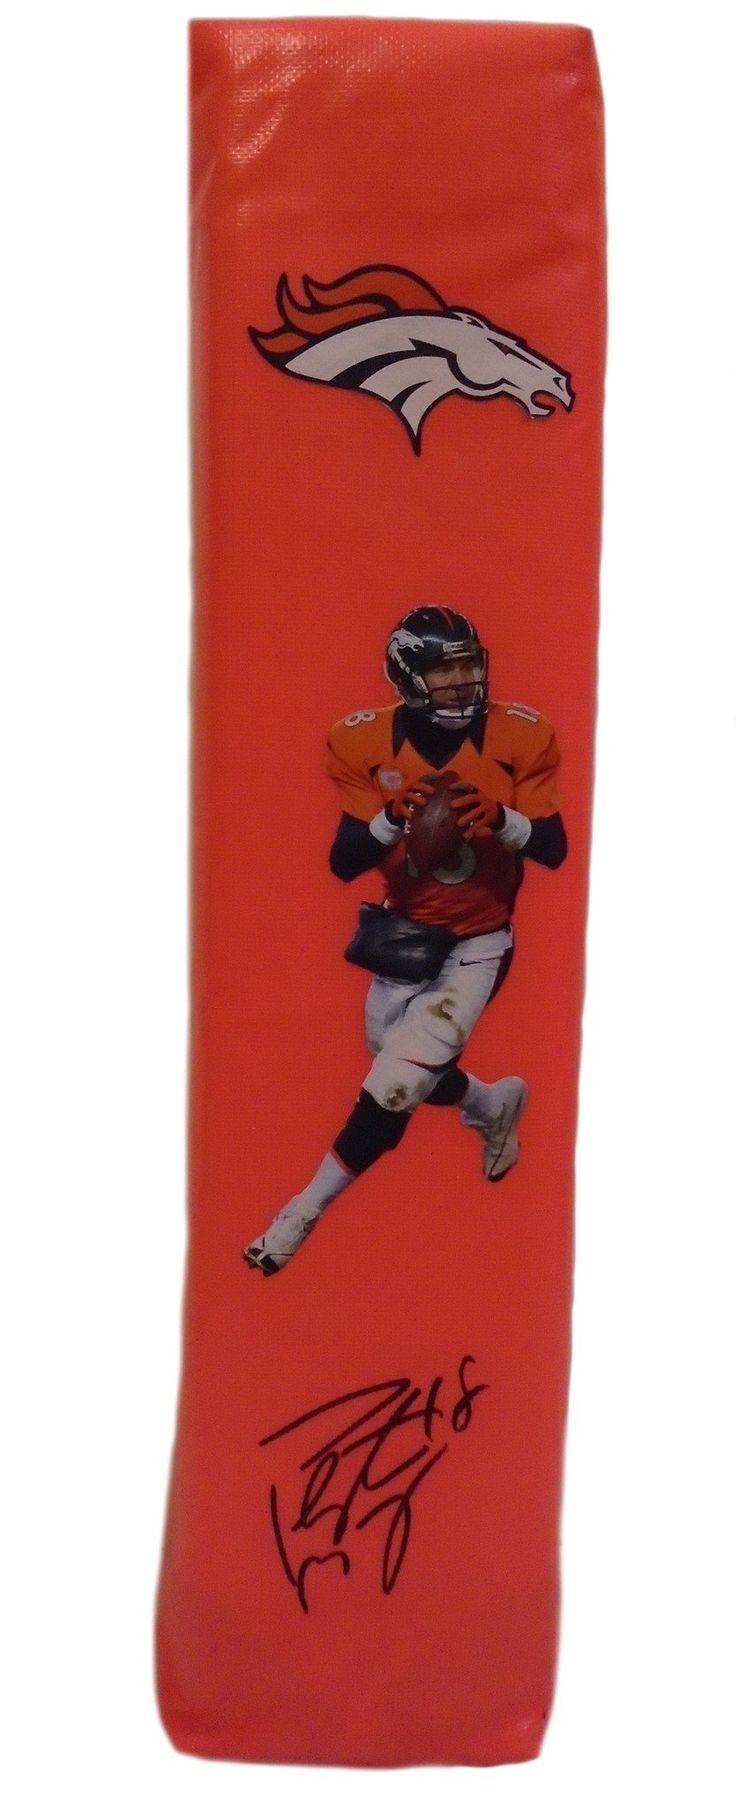 Peyton Manning Autographed Denver Broncos Photo Full Size Football End Zone Touchdown Pylon, PSA/DNA